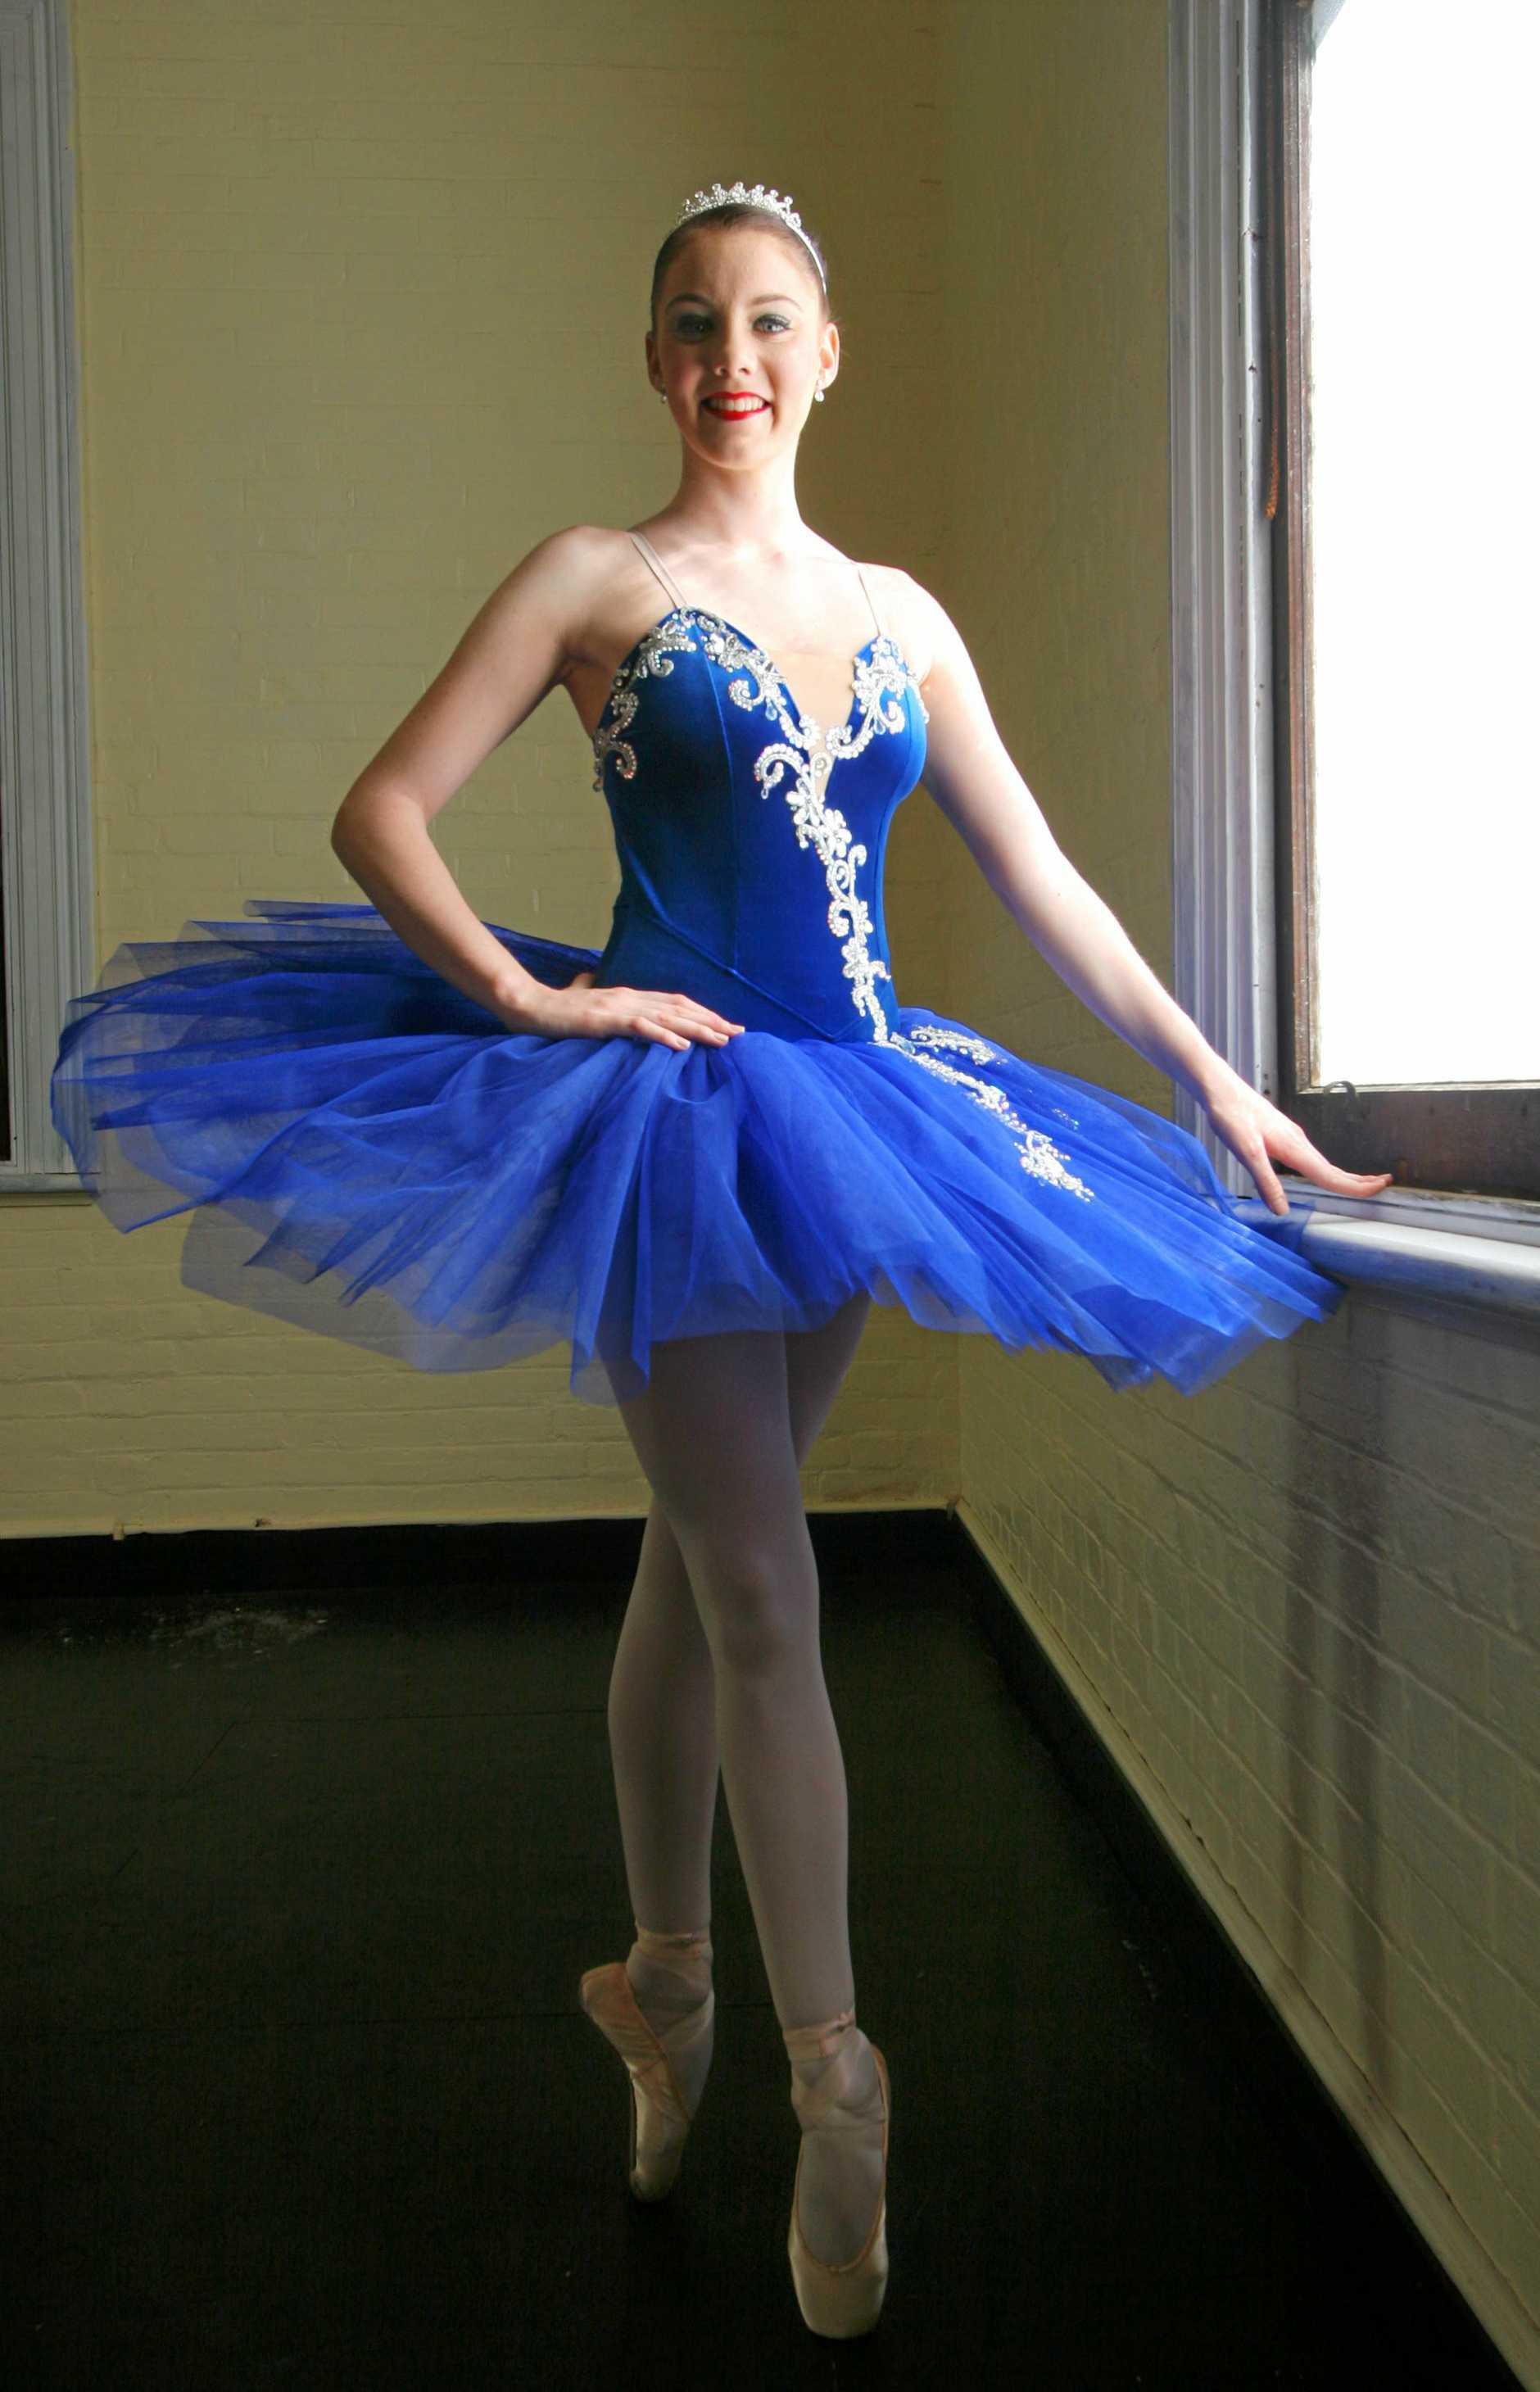 ROK-dance31   Jessica Harris   CHRIS ISON CI31-0510-12